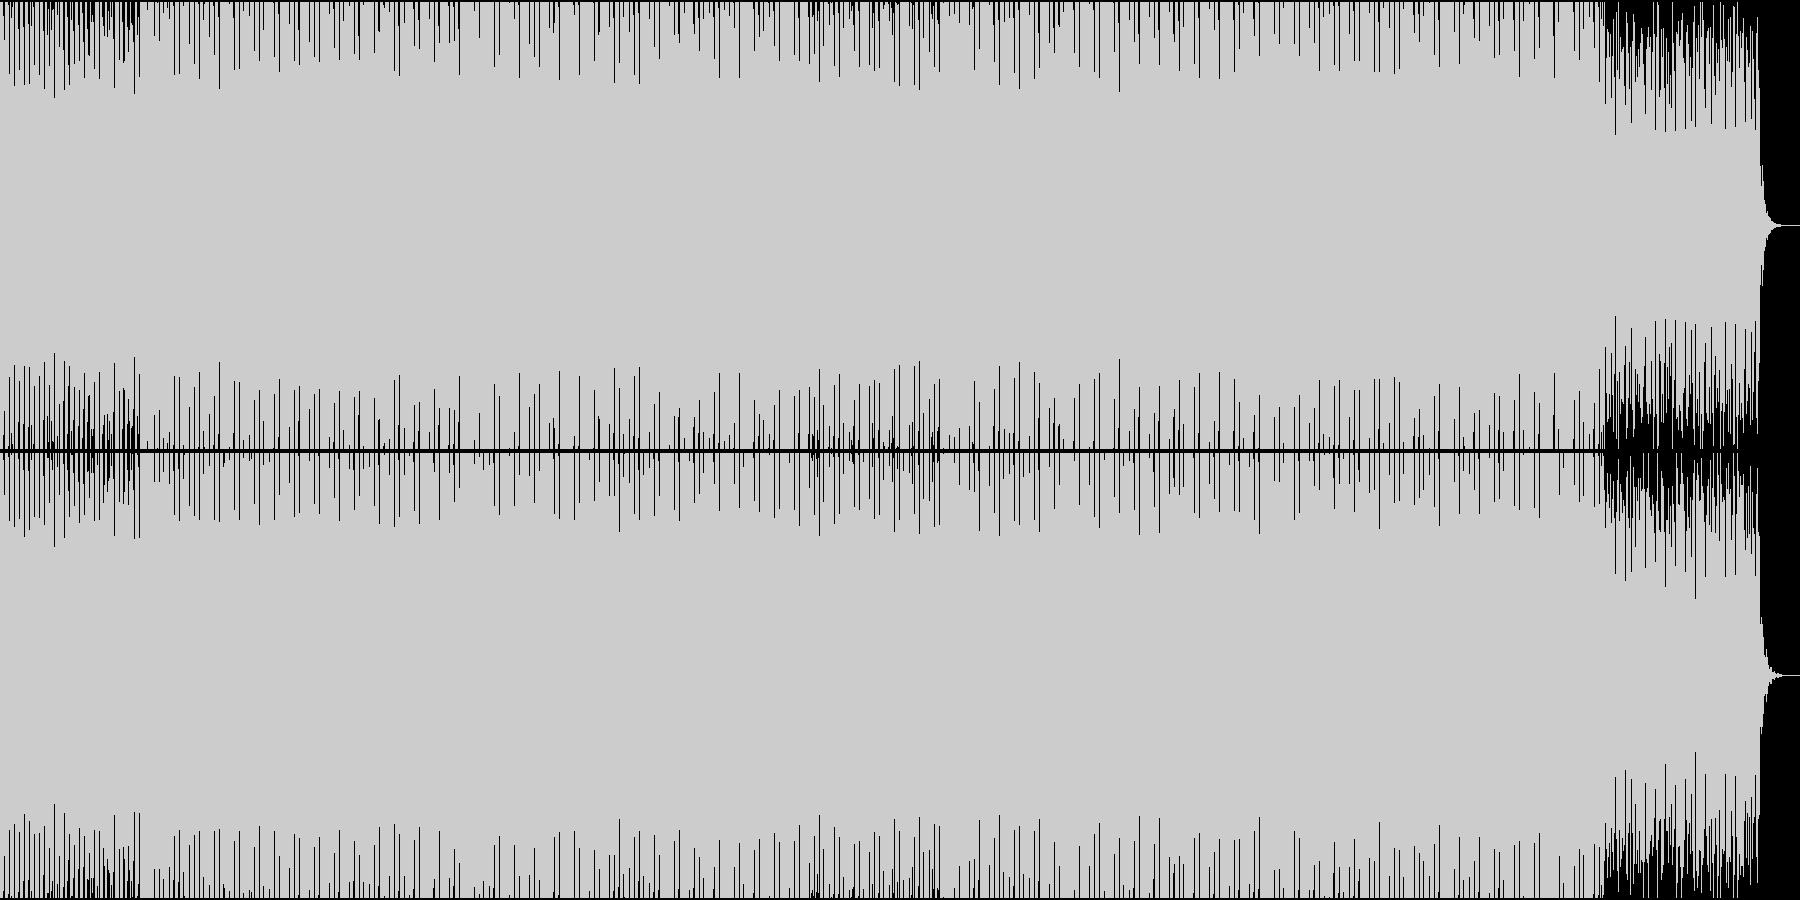 EDMクラブ系、製品紹介、商品紹介-07の未再生の波形